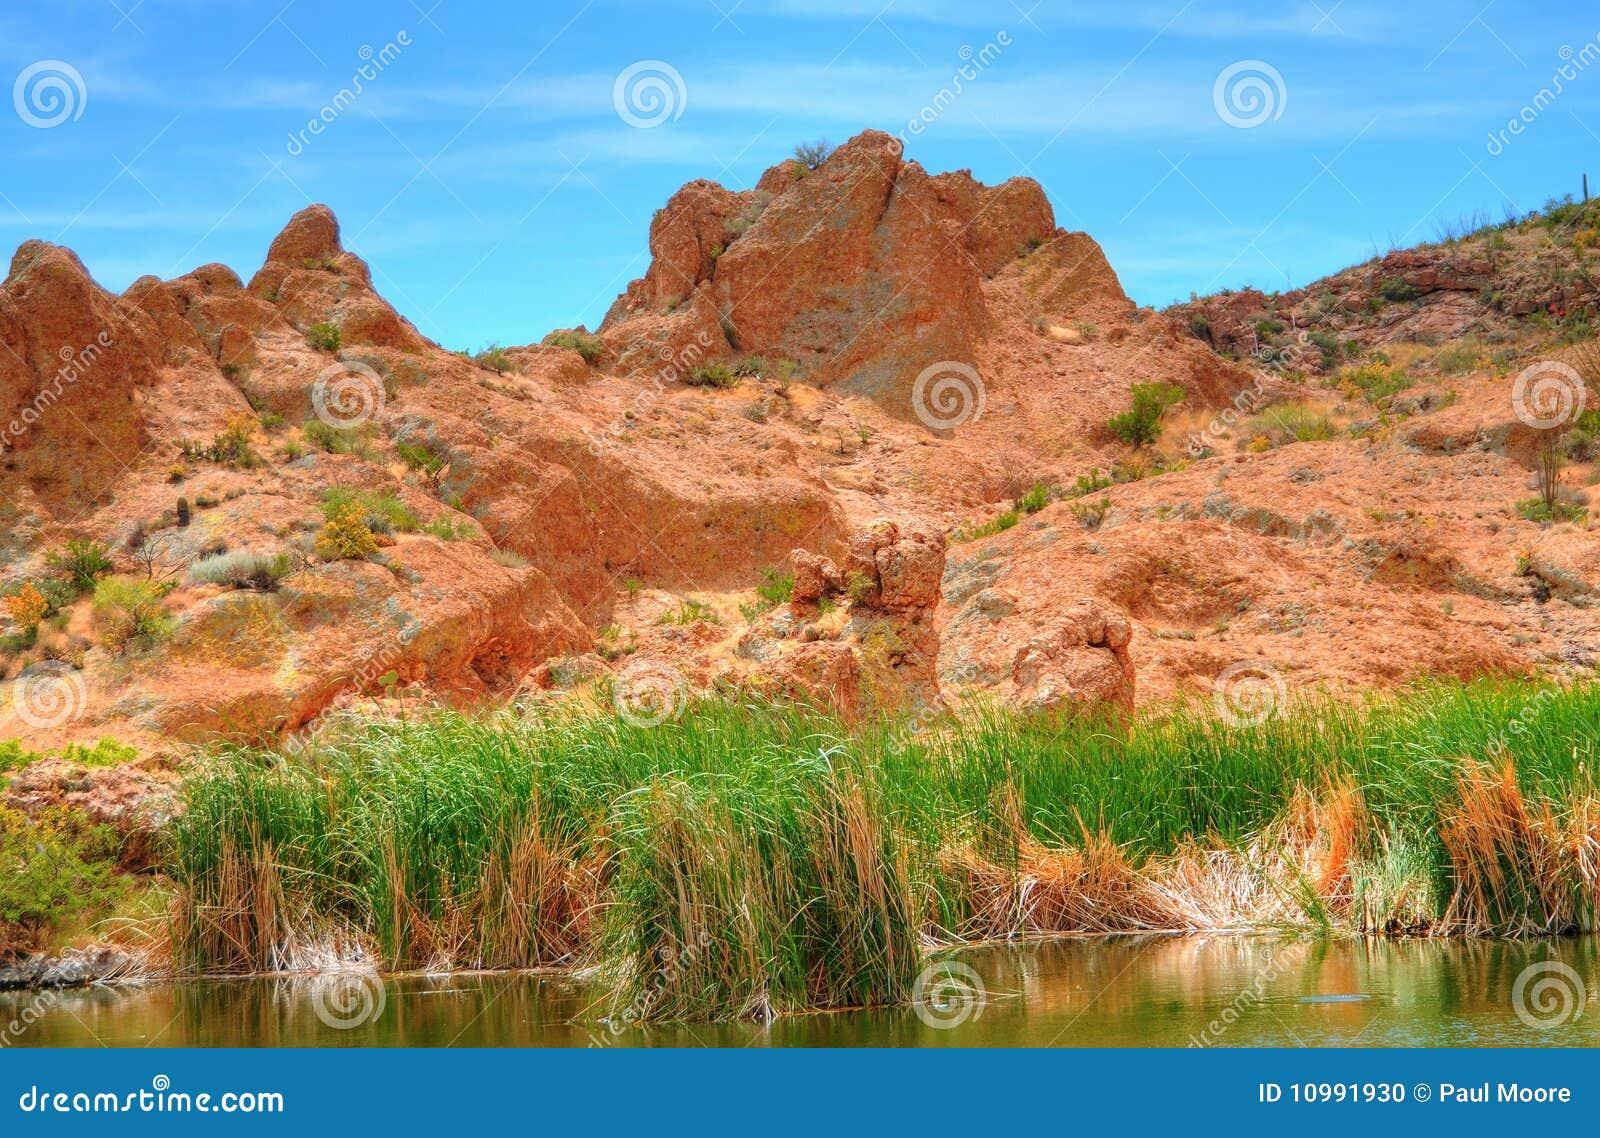 Pond In The Arizona Mountains Stock Photo Image 10991930